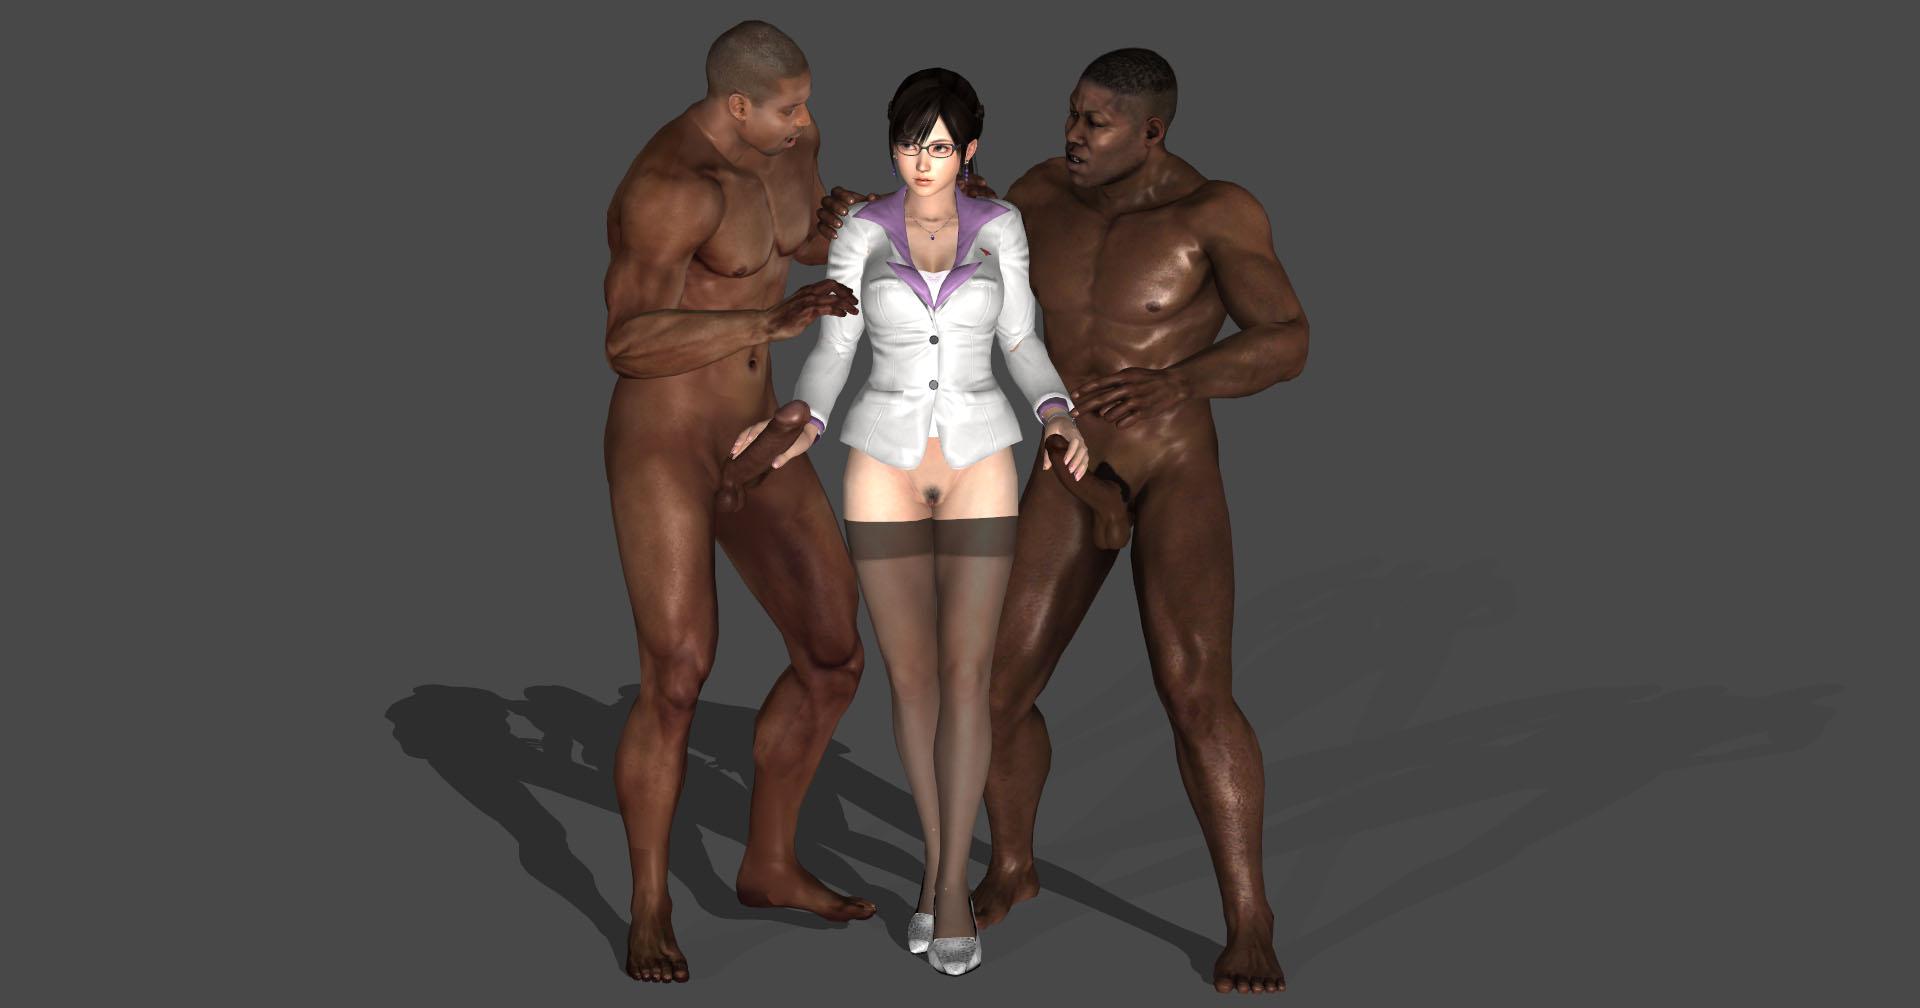 kokoro_making_porn_0002_layer_2_by_bitemonsters-dbhglbi.jpg